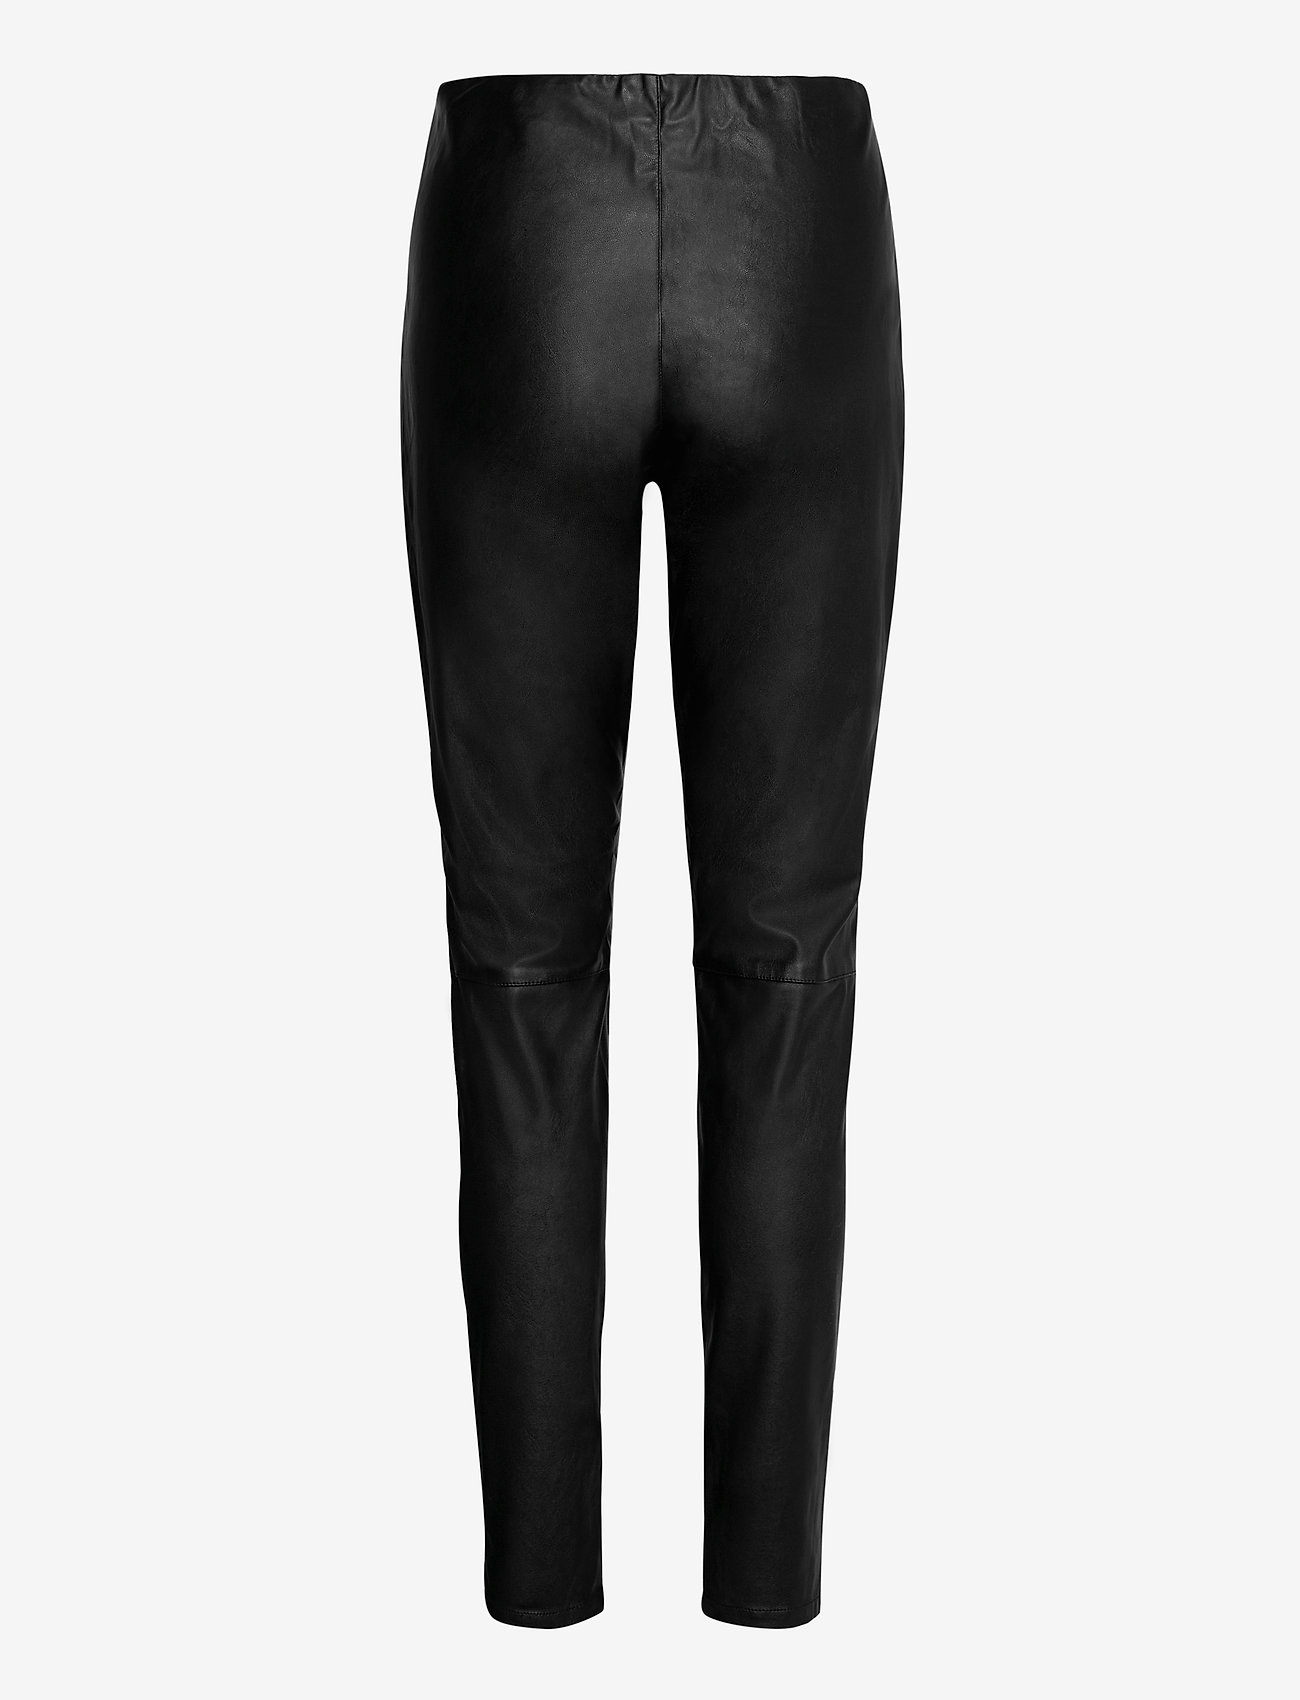 Saint Tropez - N5724, NataliaSZ Leggings - læderbukser - black - 1